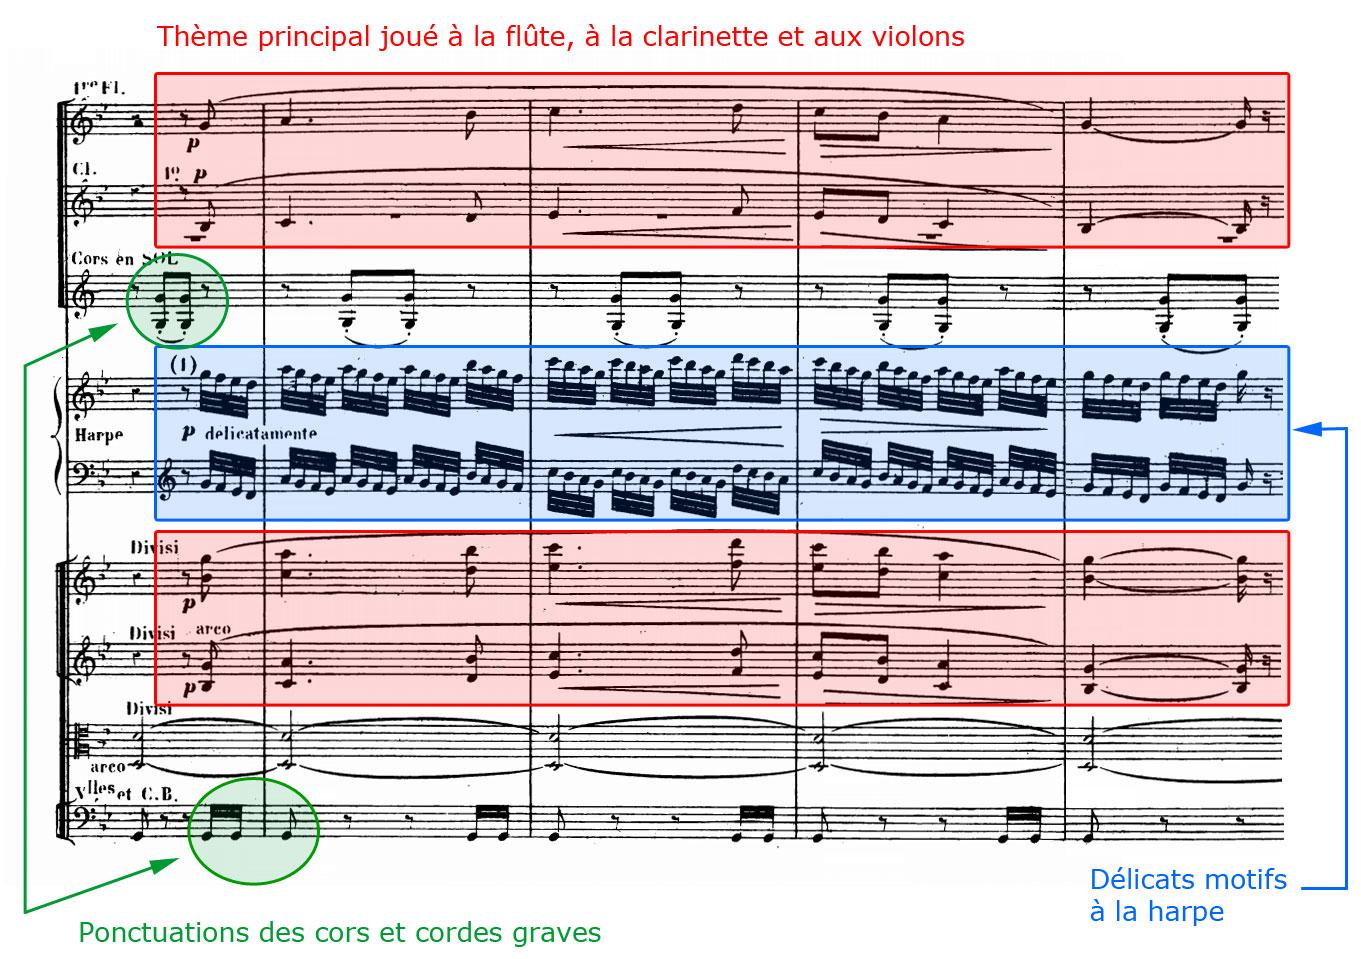 Partition, La Princesse jaune, Andantino, thème 1